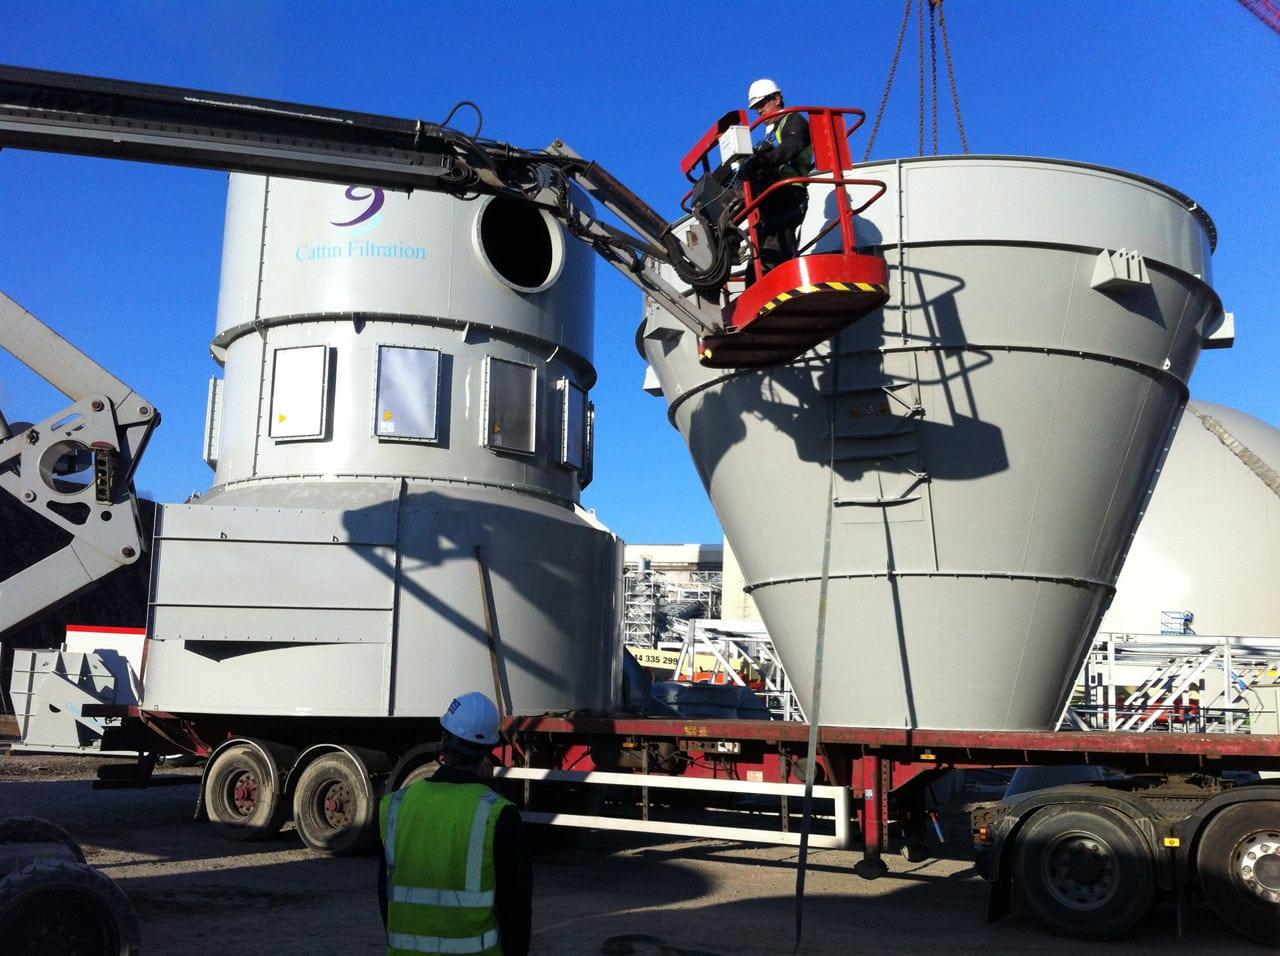 Installation of Cyclofilter at Drax Power Station